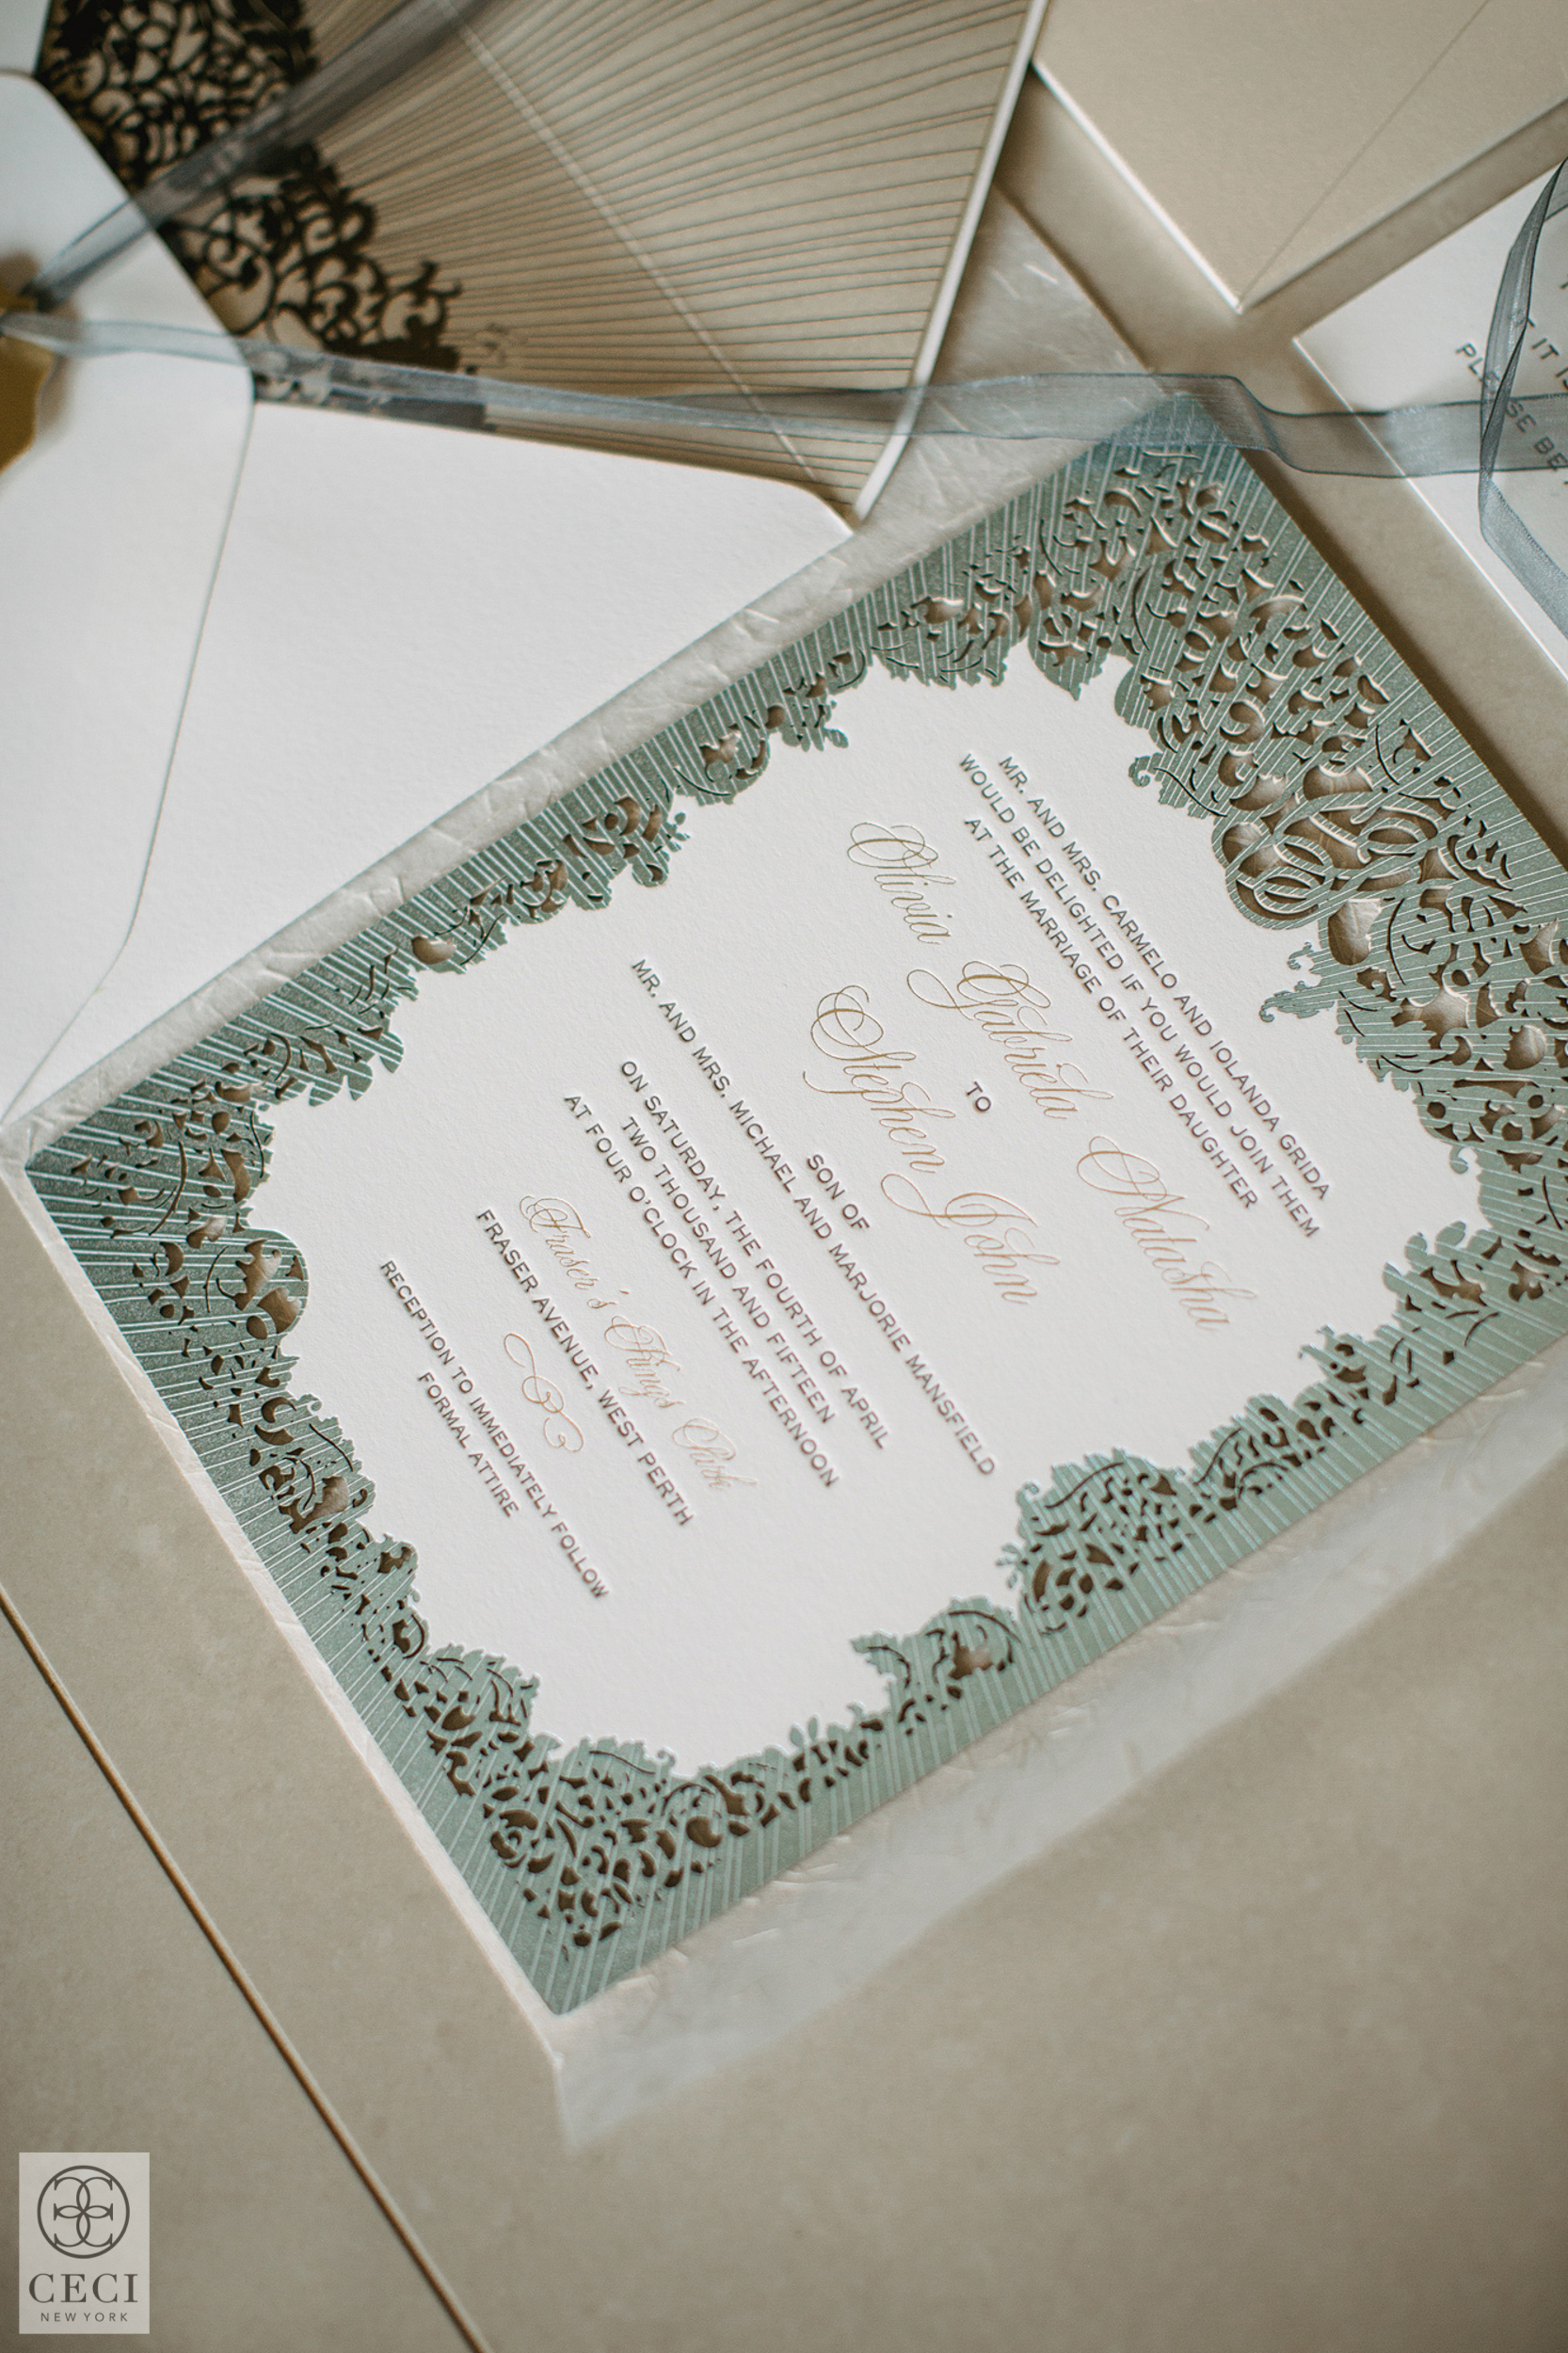 Ceci_New_York_Custom_Luxury_Wedding_BeautyShot_LaserCut_Stationery_Personalized_Couture_Foil_Stamping_Perth_Destination_Australia_Chic_-6.jpg